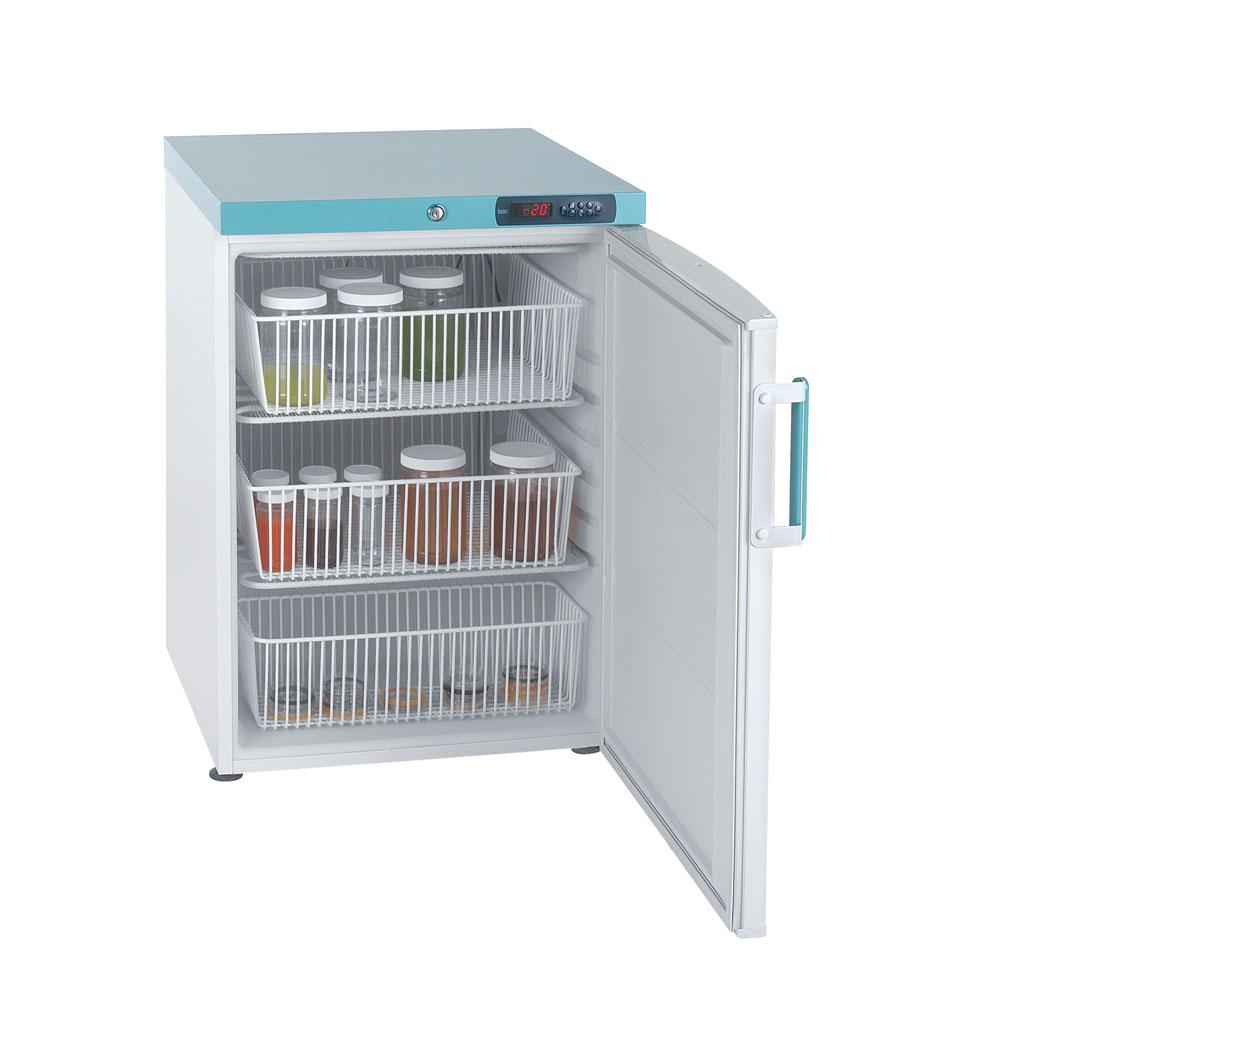 151 litre LSF151UK Lec Pharmacy Freezer